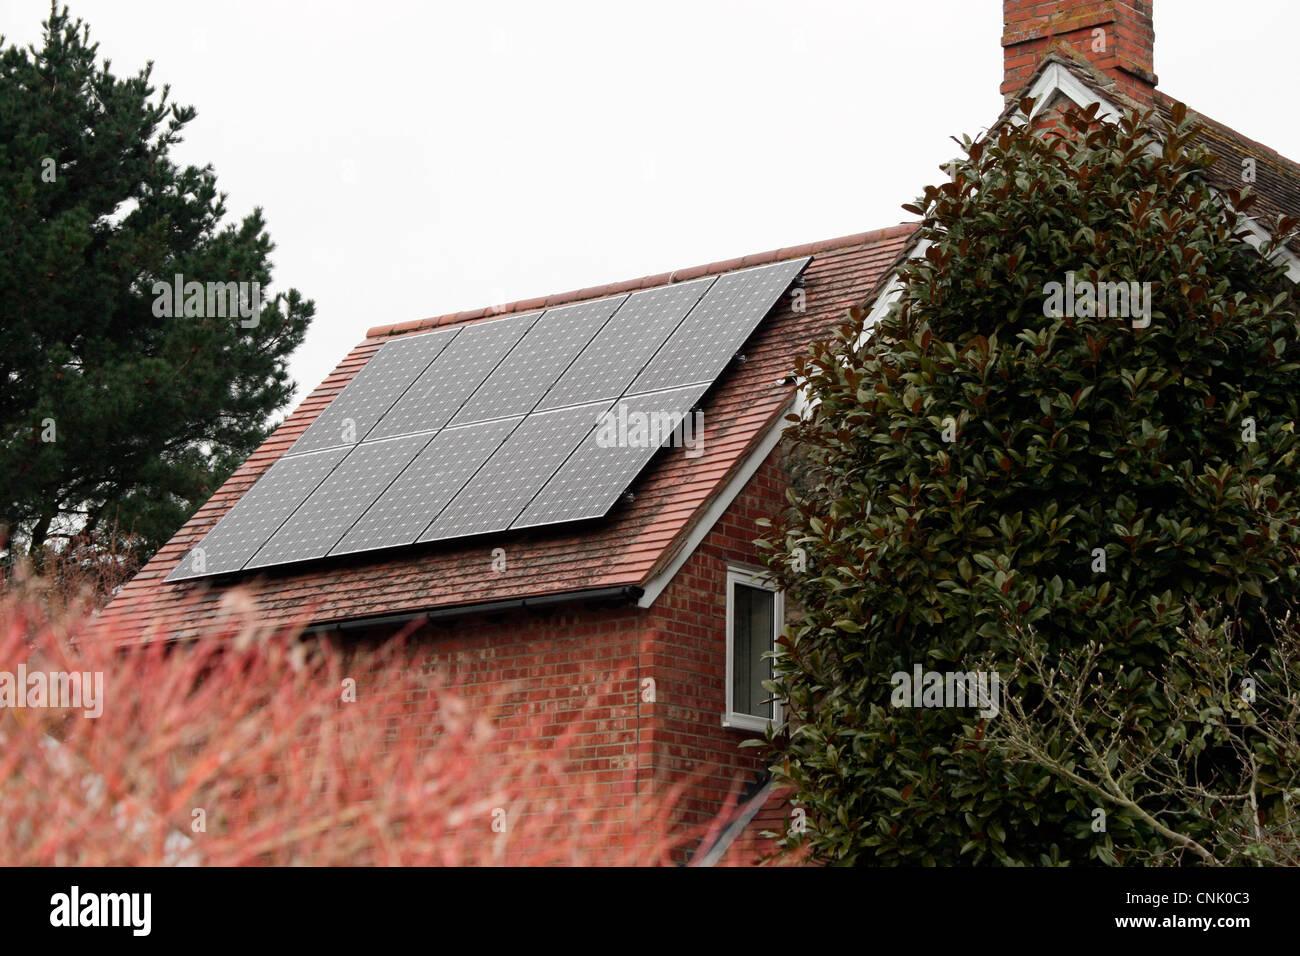 Photovoltaic Solar Energy Panels - Stock Image